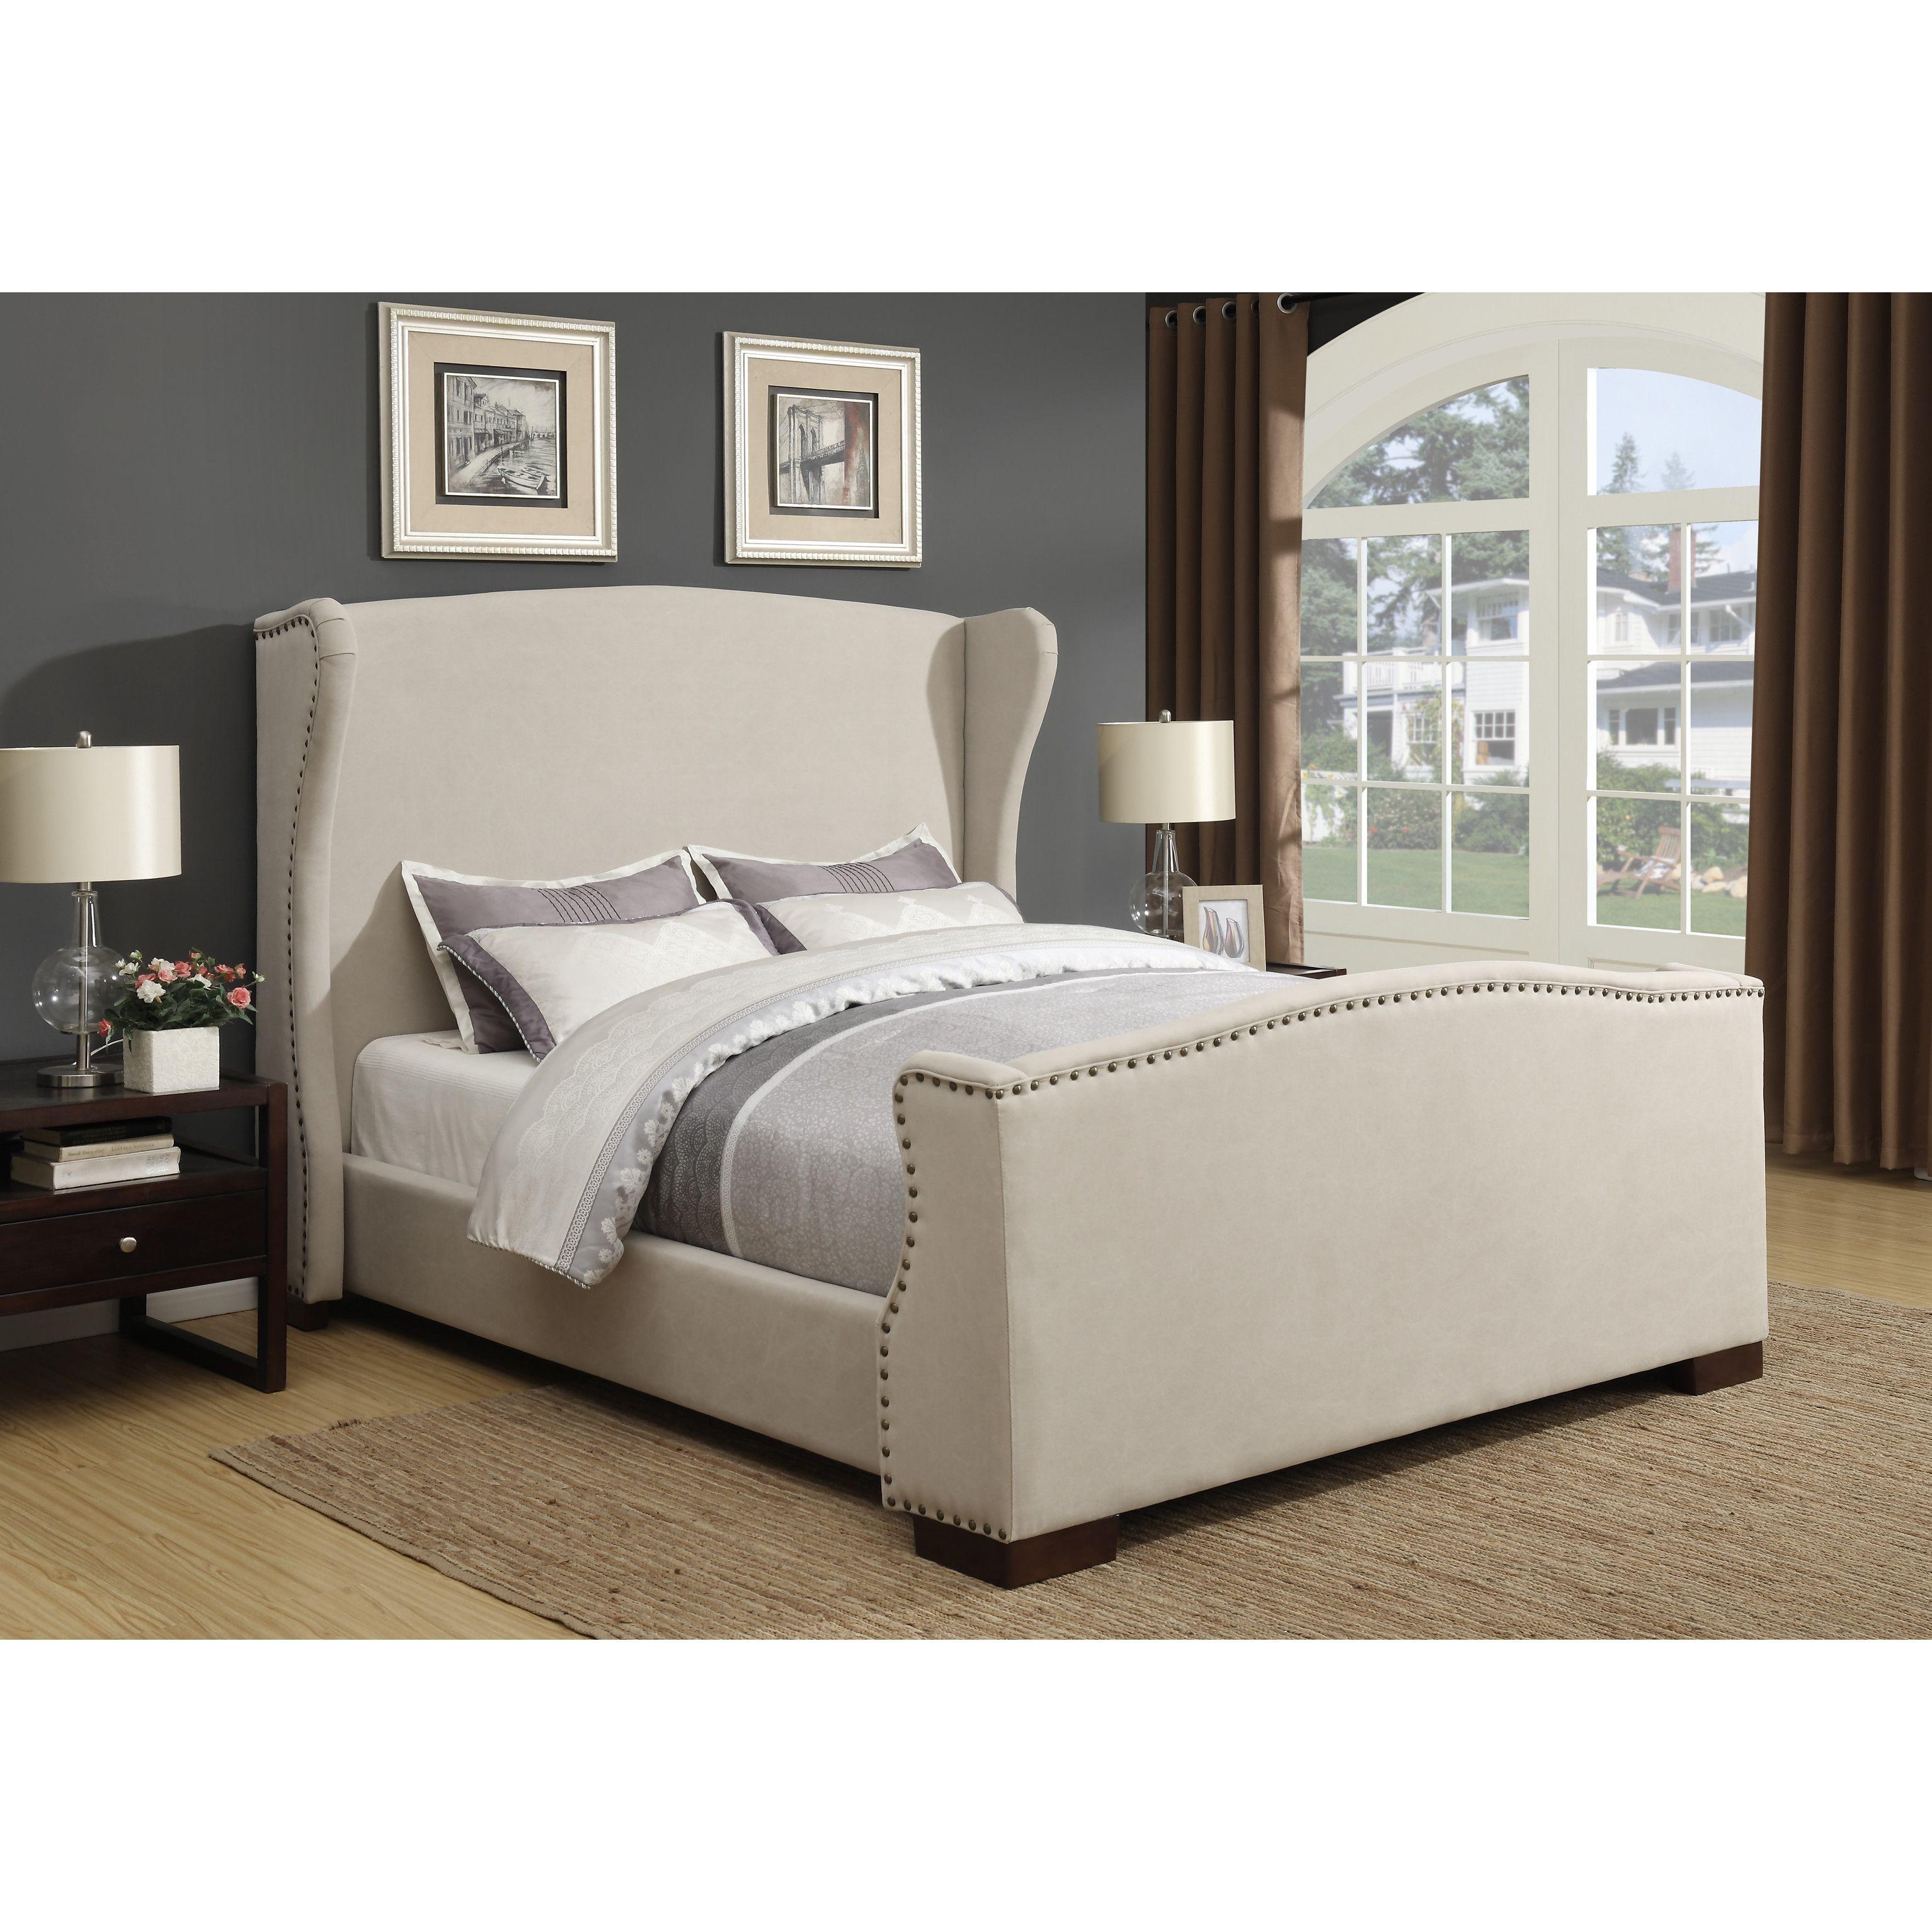 Wingback bed Kincaid furniture, Furniture, Bed